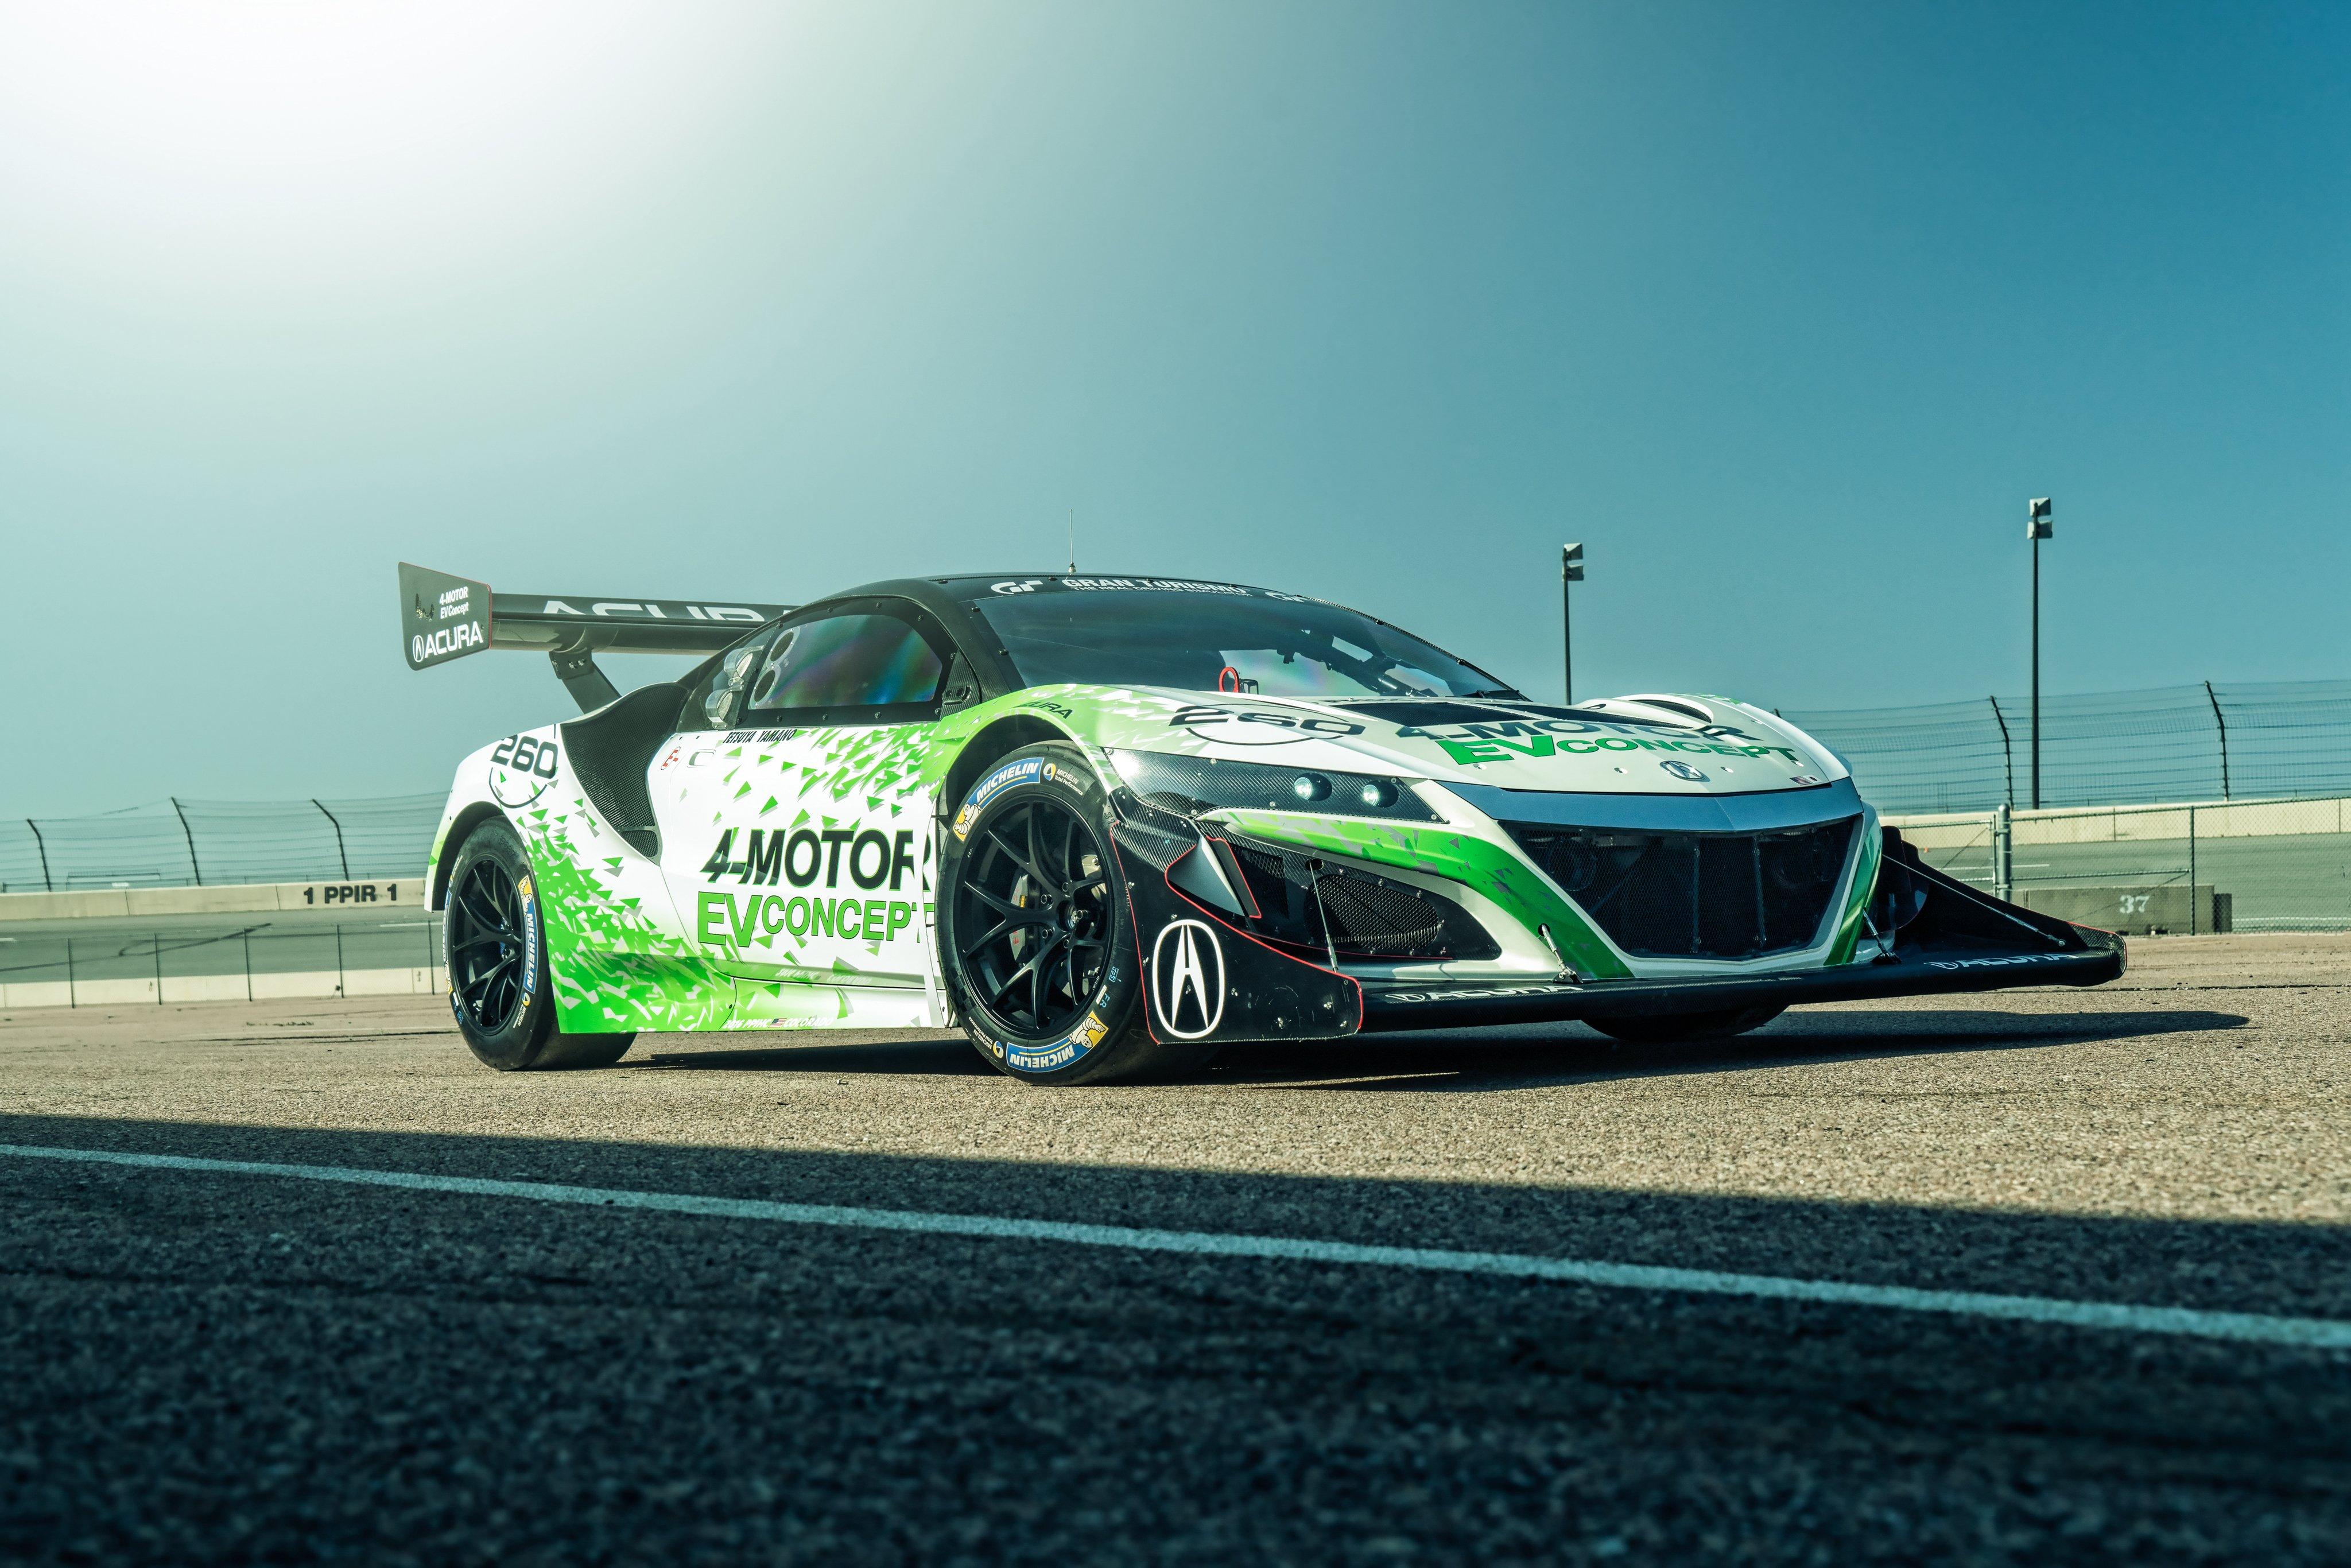 2016 Acura NSX EV Concept race racing rally pikes peak ev supercar